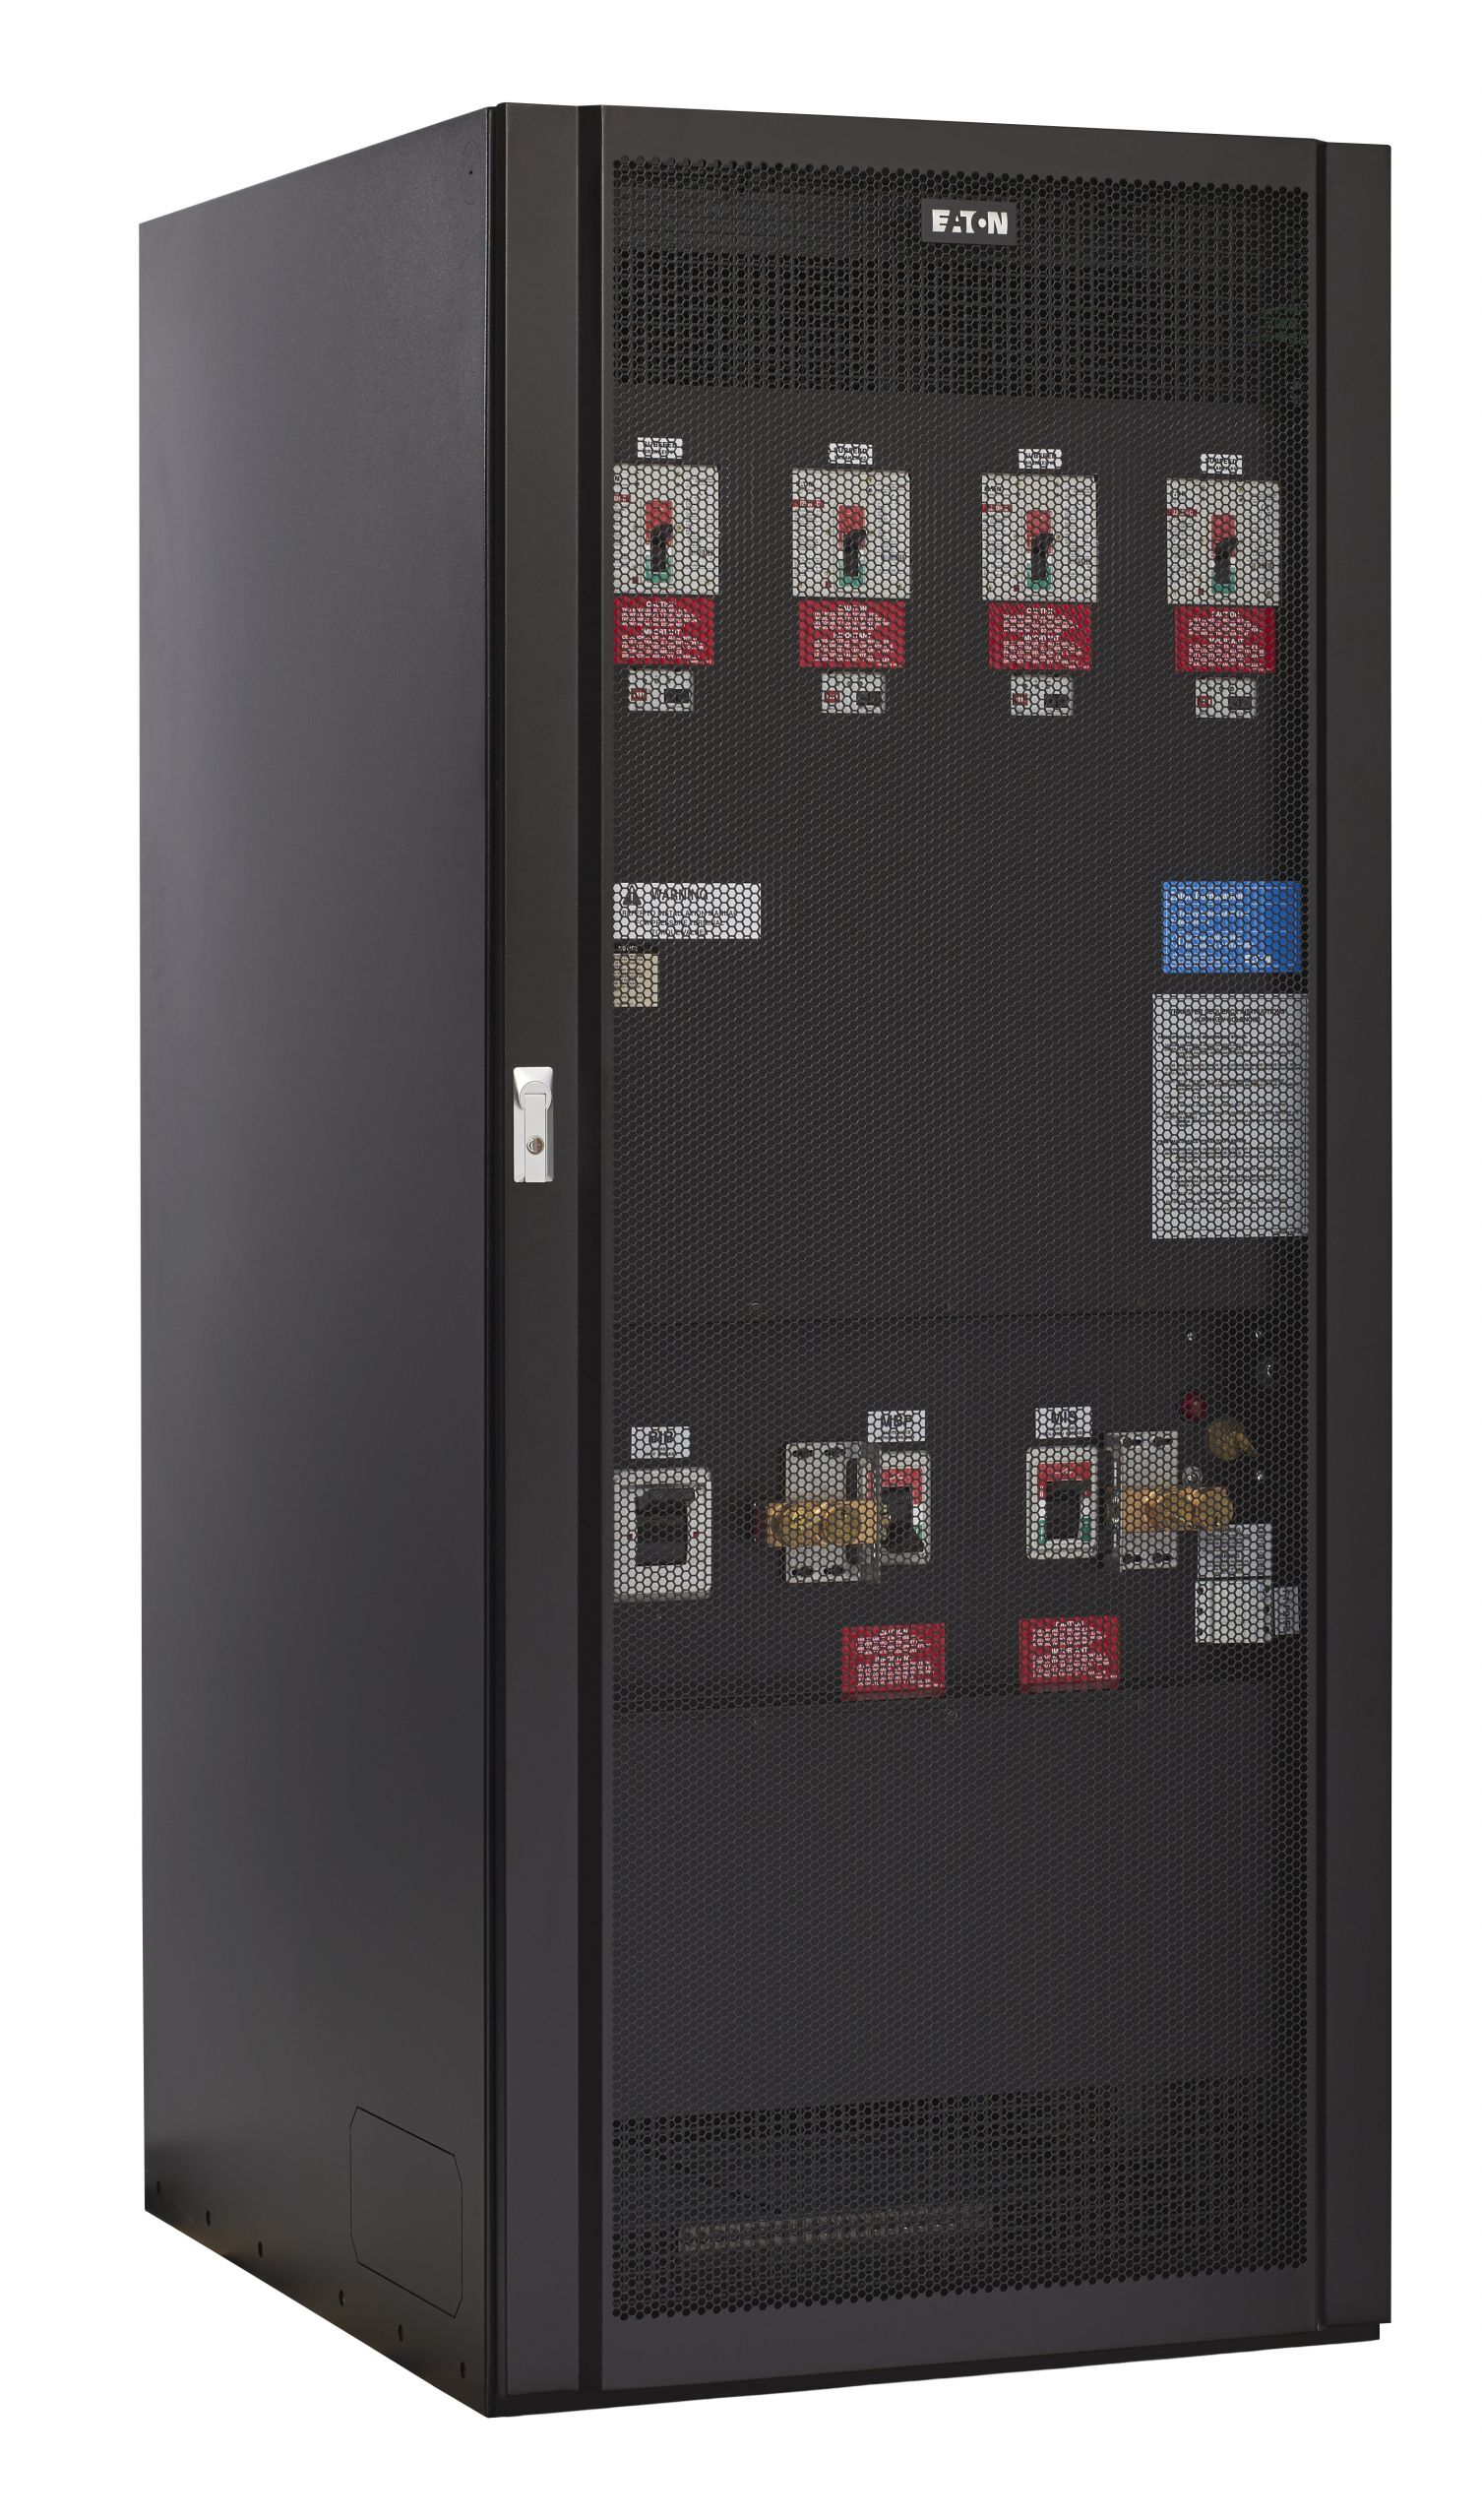 Eaton 93pm Ups Wiring Diagram Eaton 93pm Ups Lithium Ion Uninterruptible Power Supply